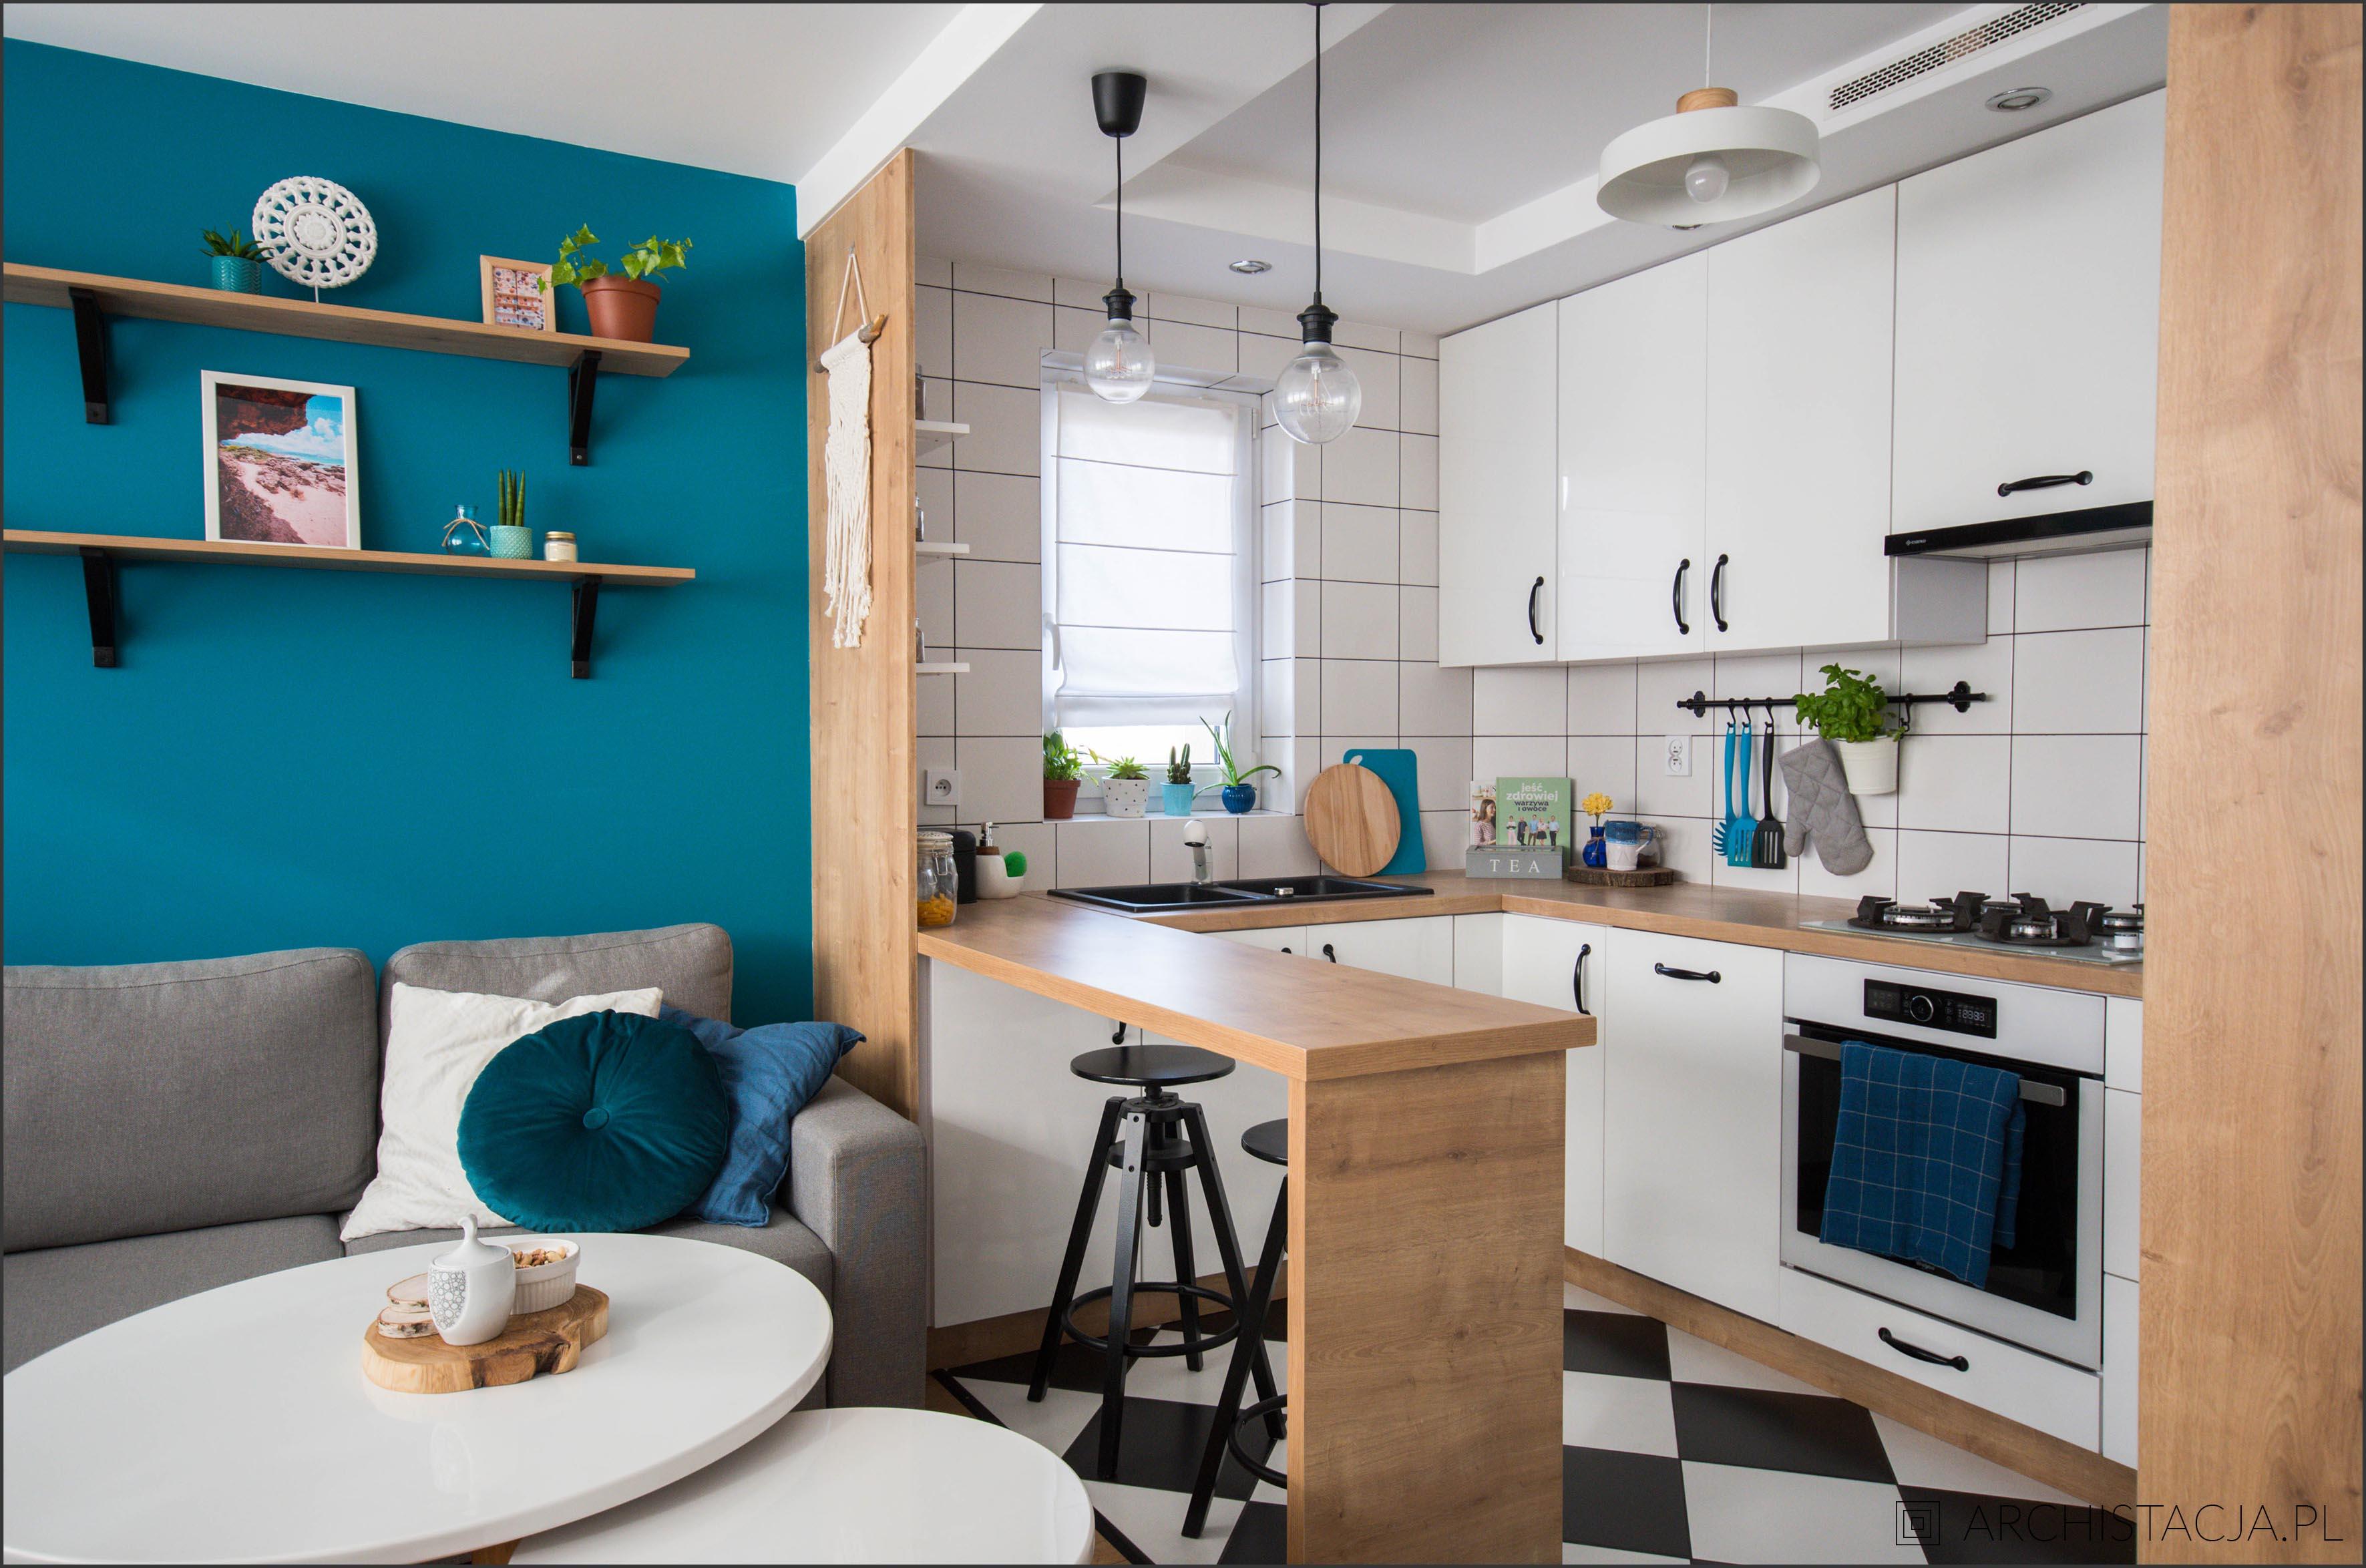 Otwarta Kuchnia Moja Opinia Archistacja Pl